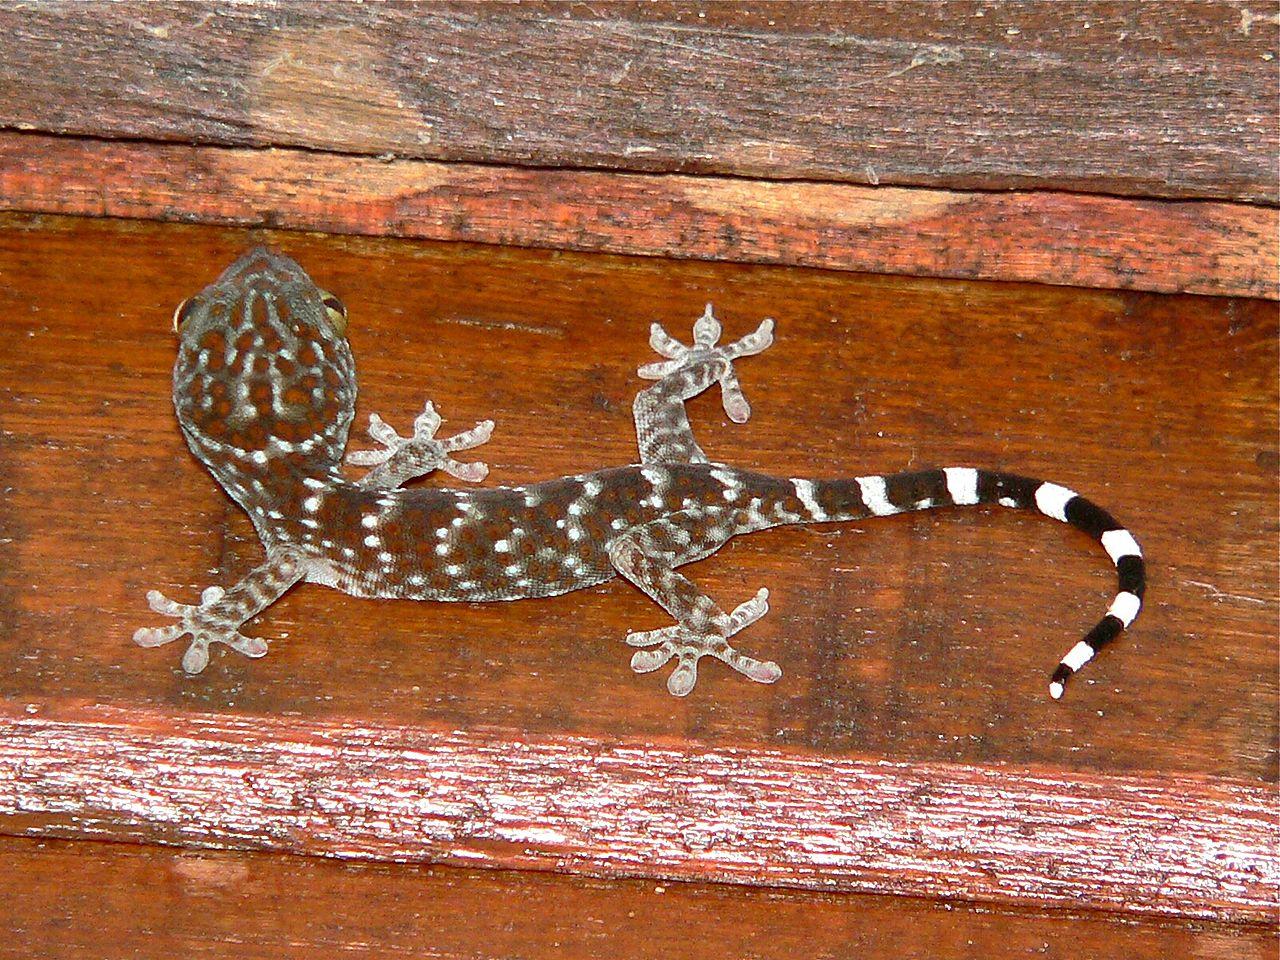 Tokay Gecko svg #6, Download drawings